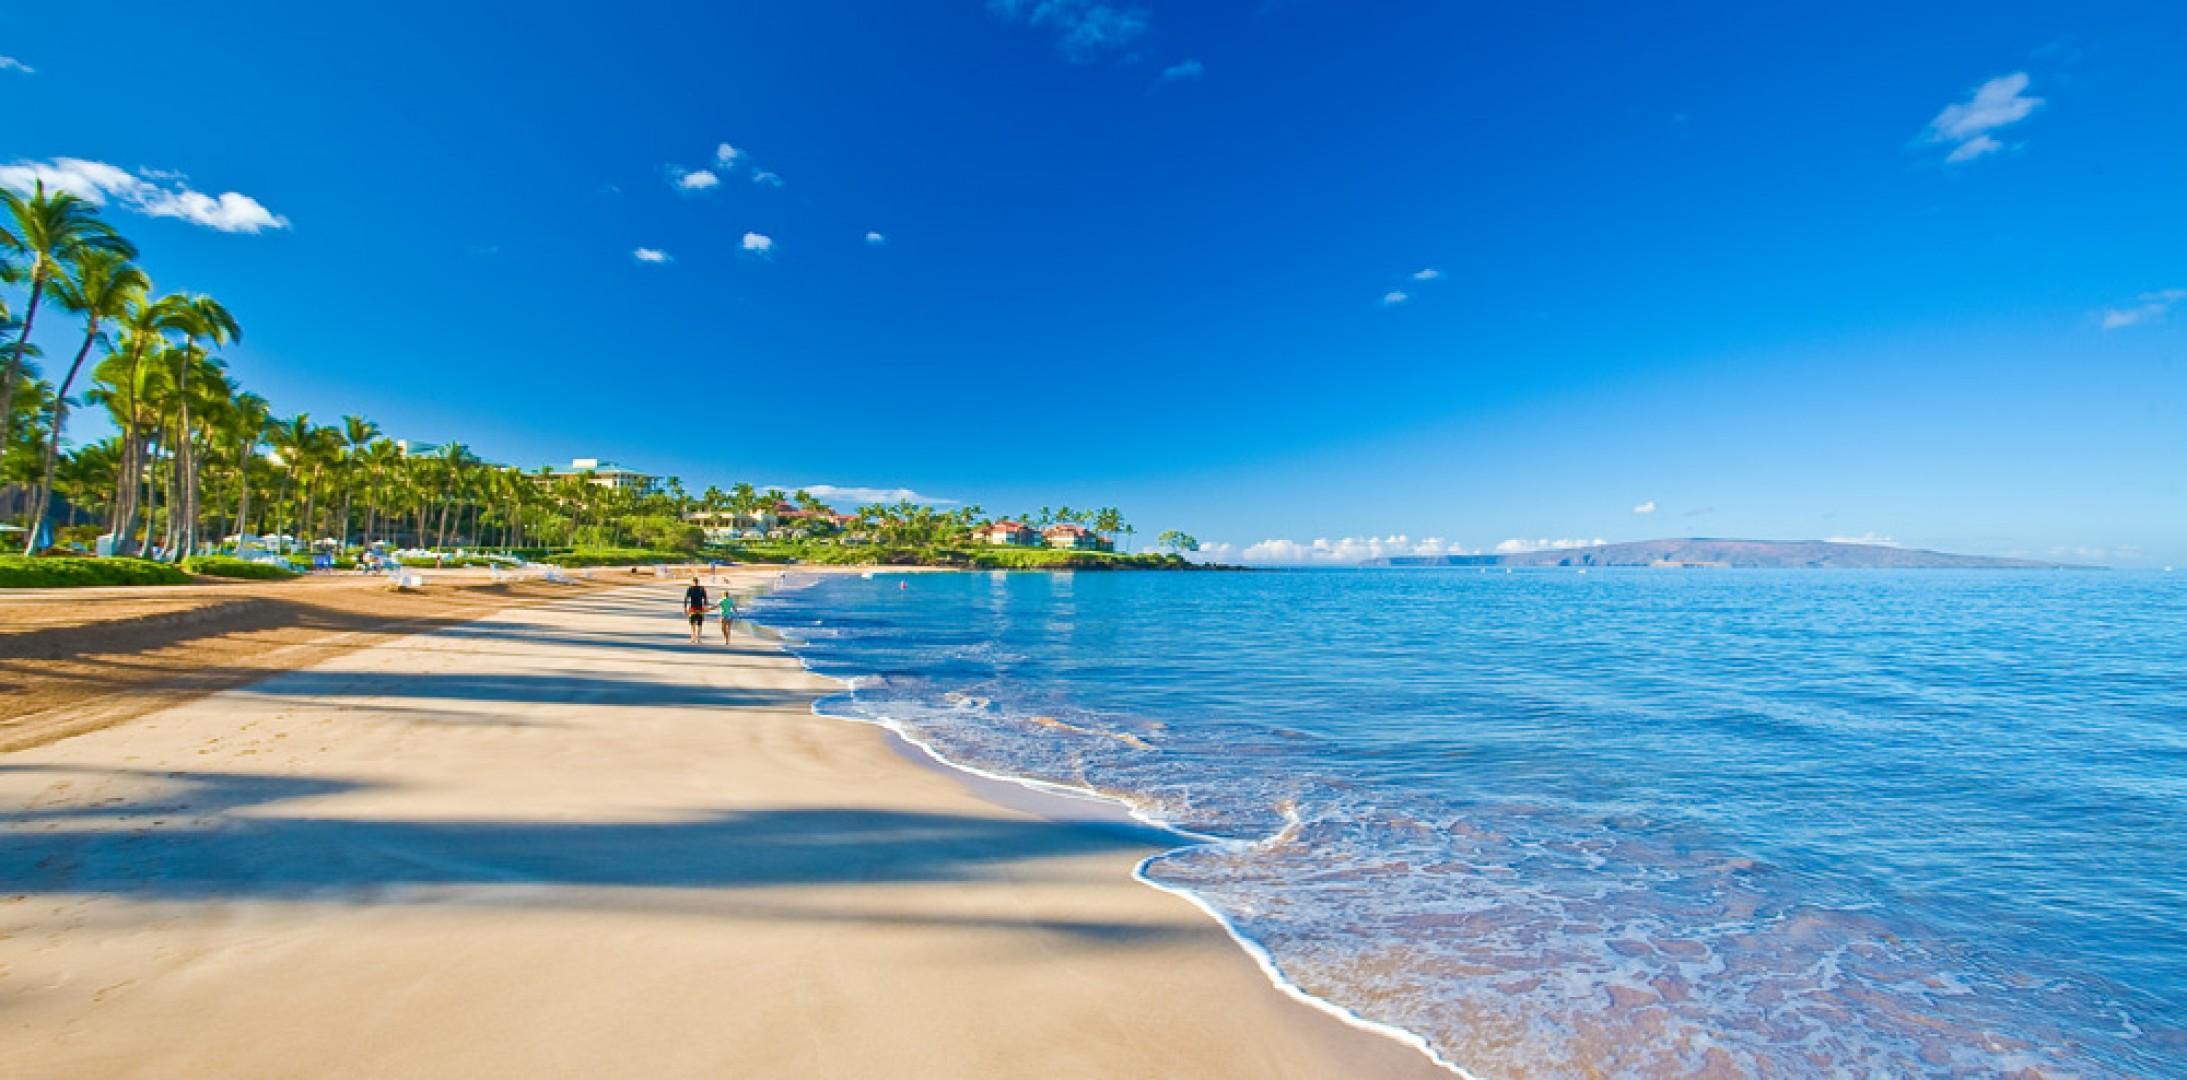 Famous Wailea Beach - Access Wailea Beach Direct from Wailea Beach Villas!